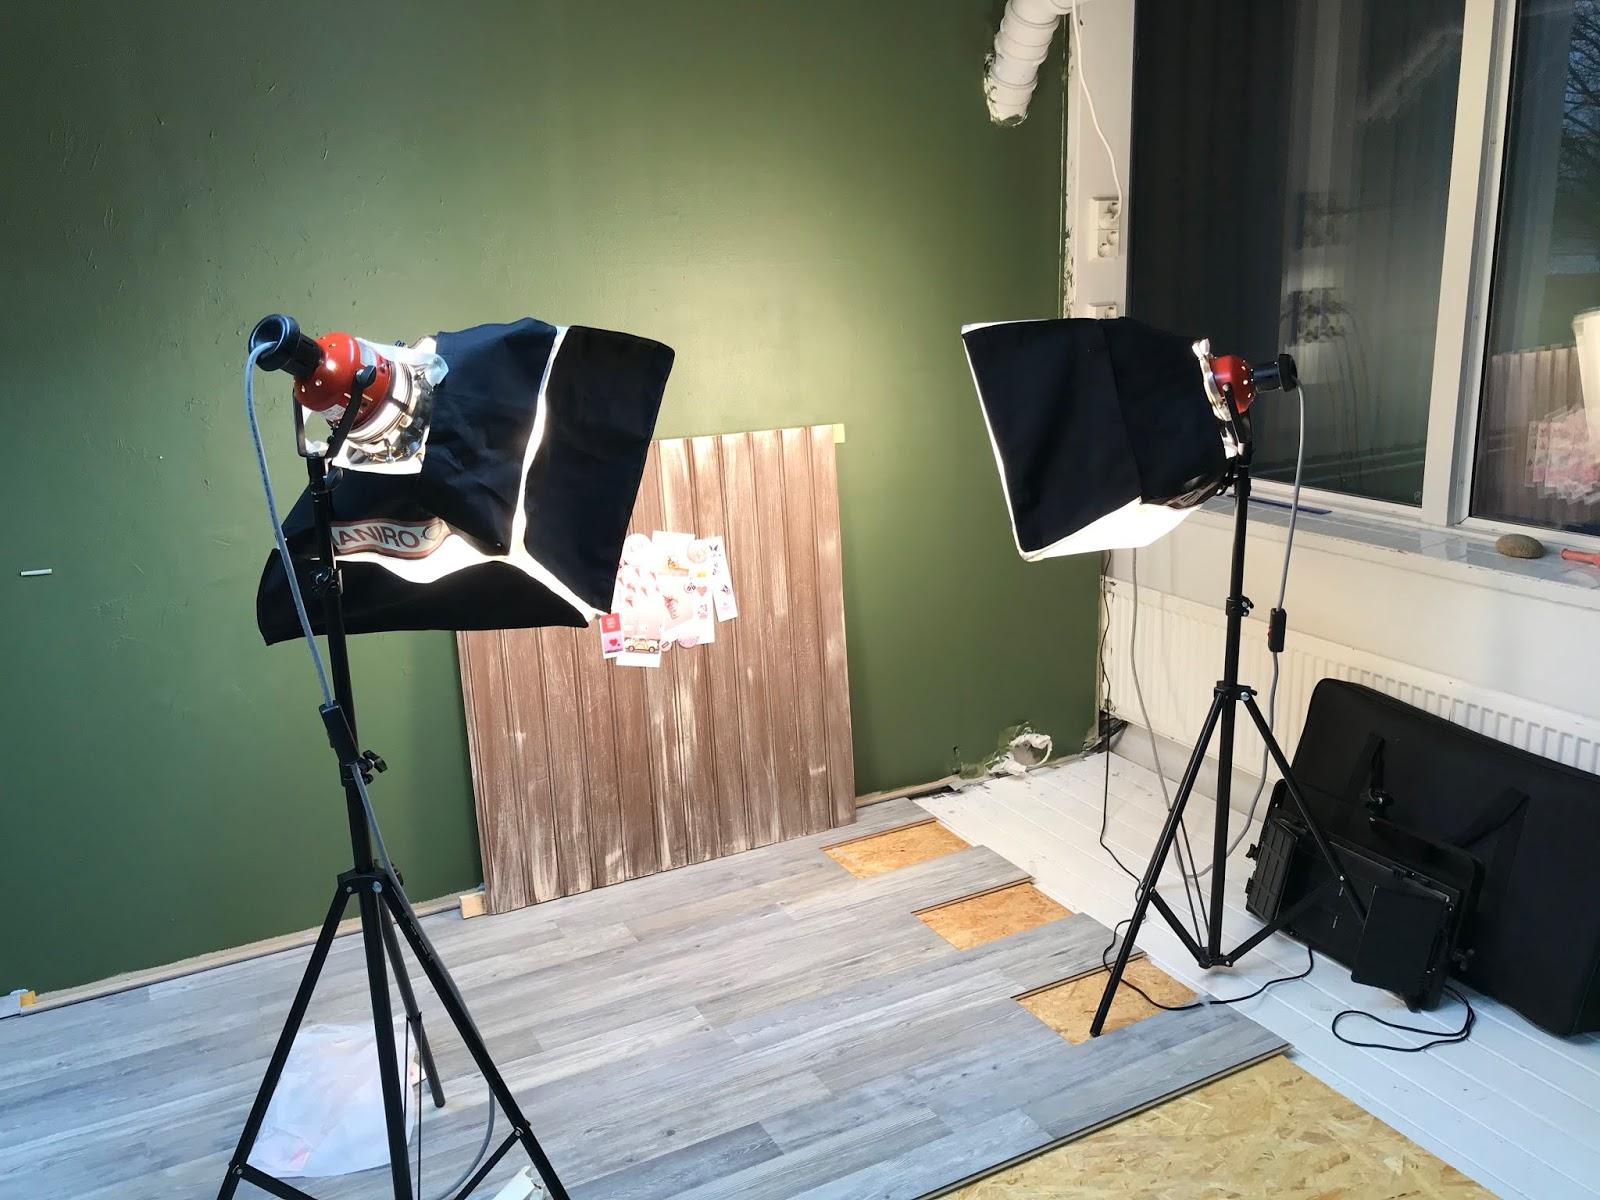 Kuvaus-setup